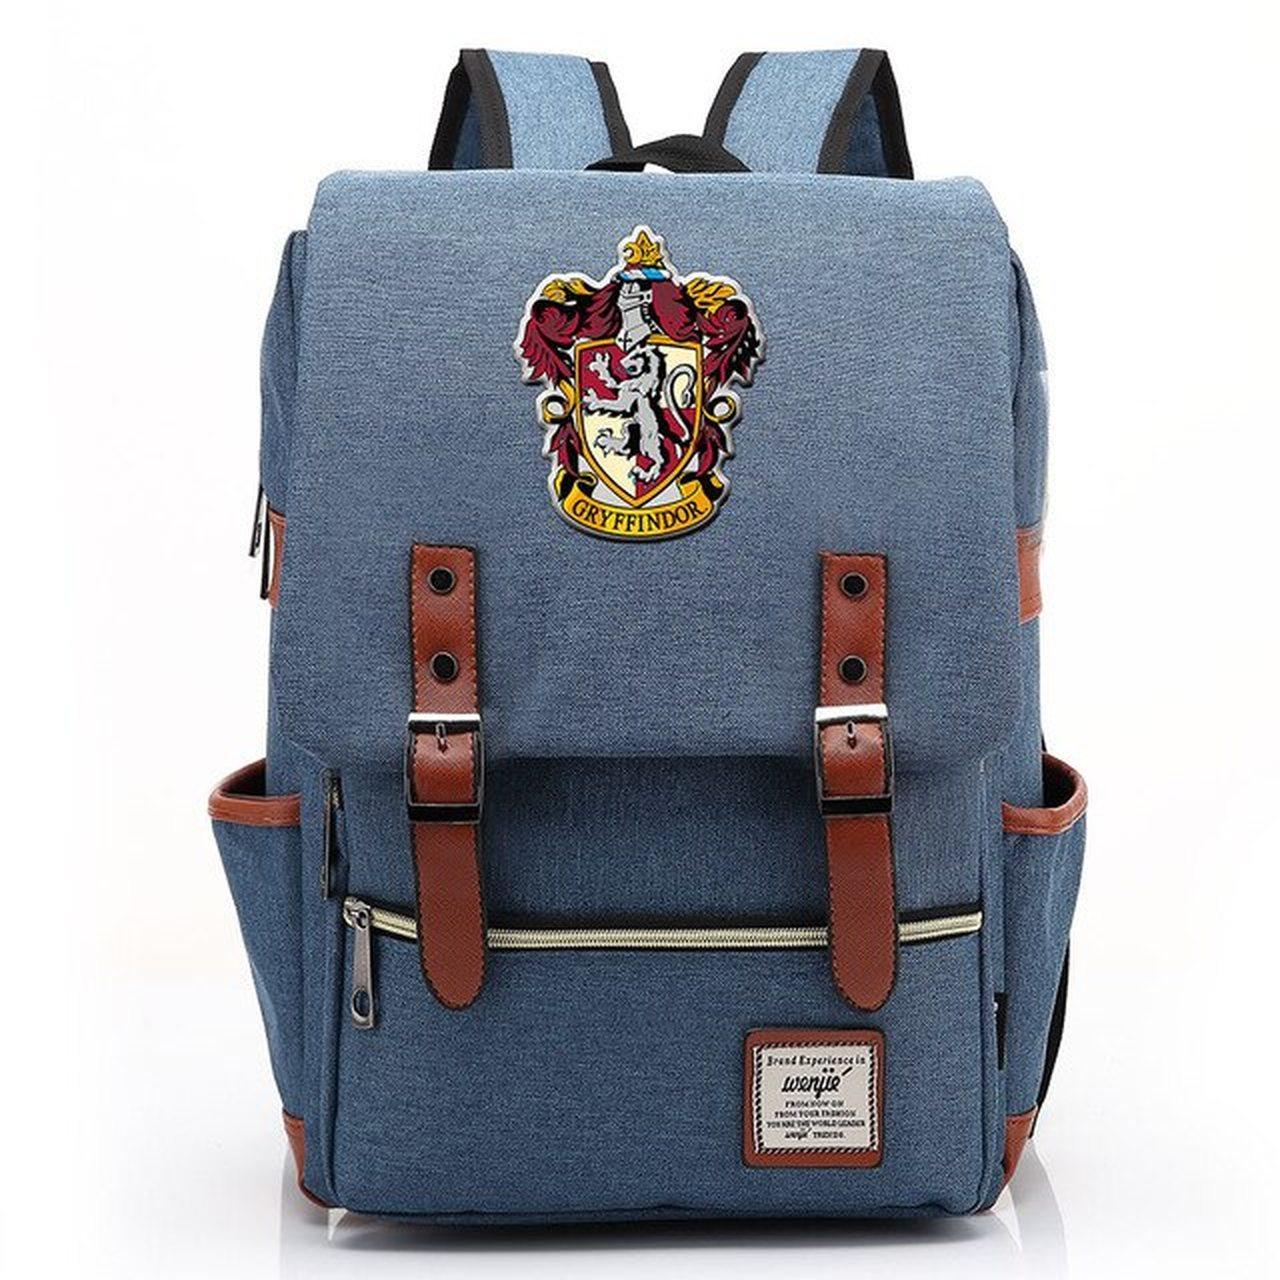 Mochila Hogwarts Casa Grifinória: Harry Potter (Azul)